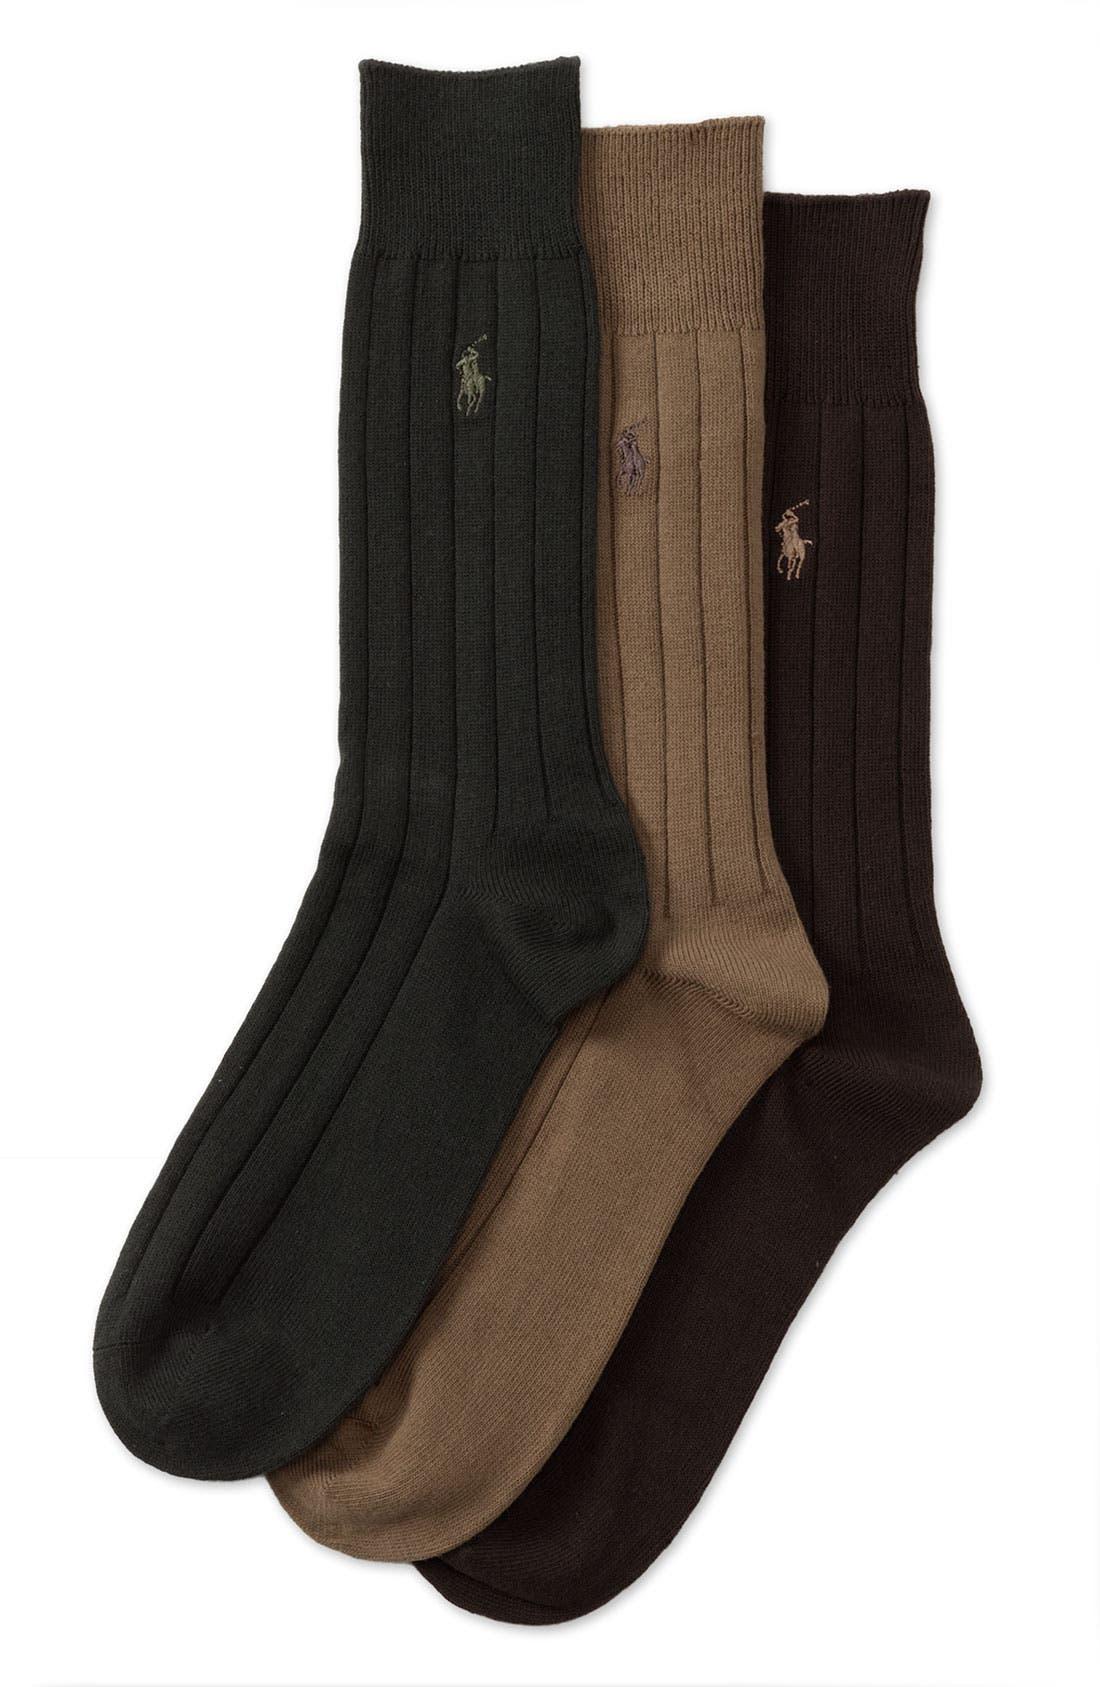 3-Pack Crew Socks,                         Main,                         color, Tobacco, Olive, Brown